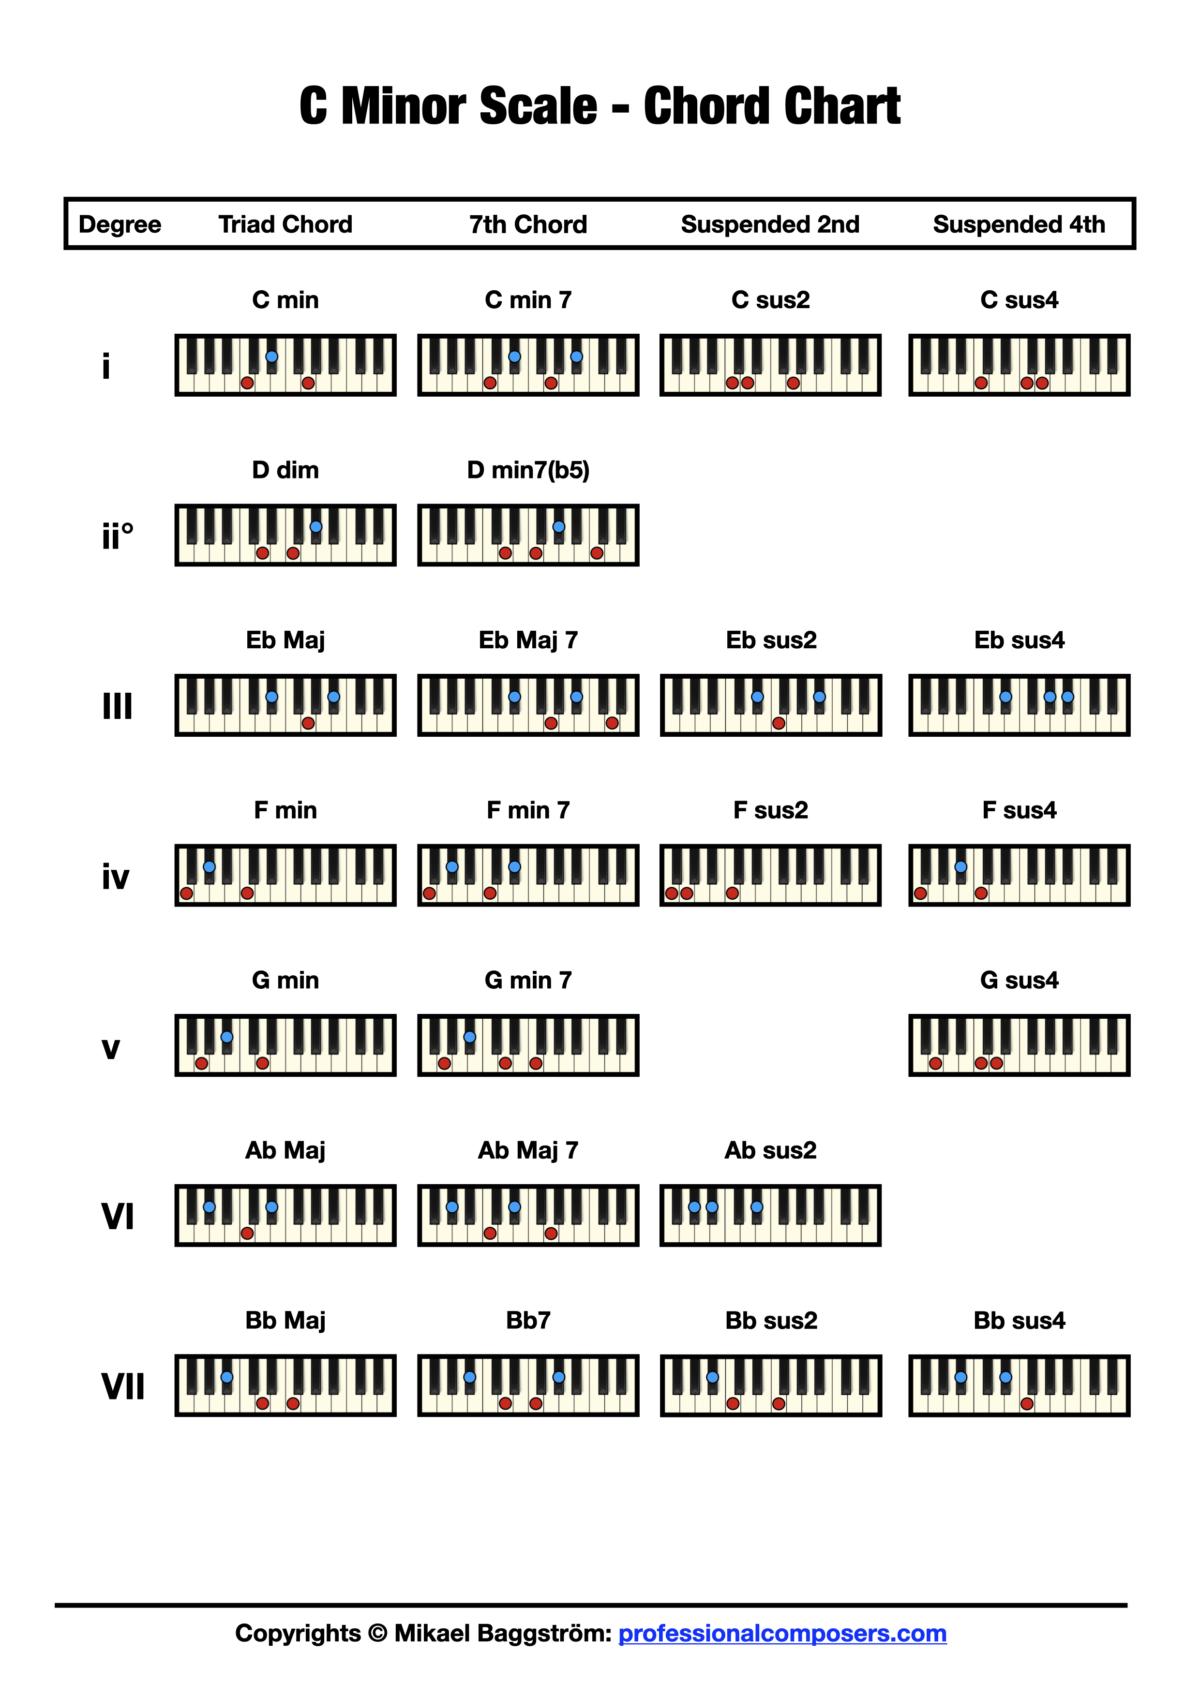 Chord Chart - C Minor Scale